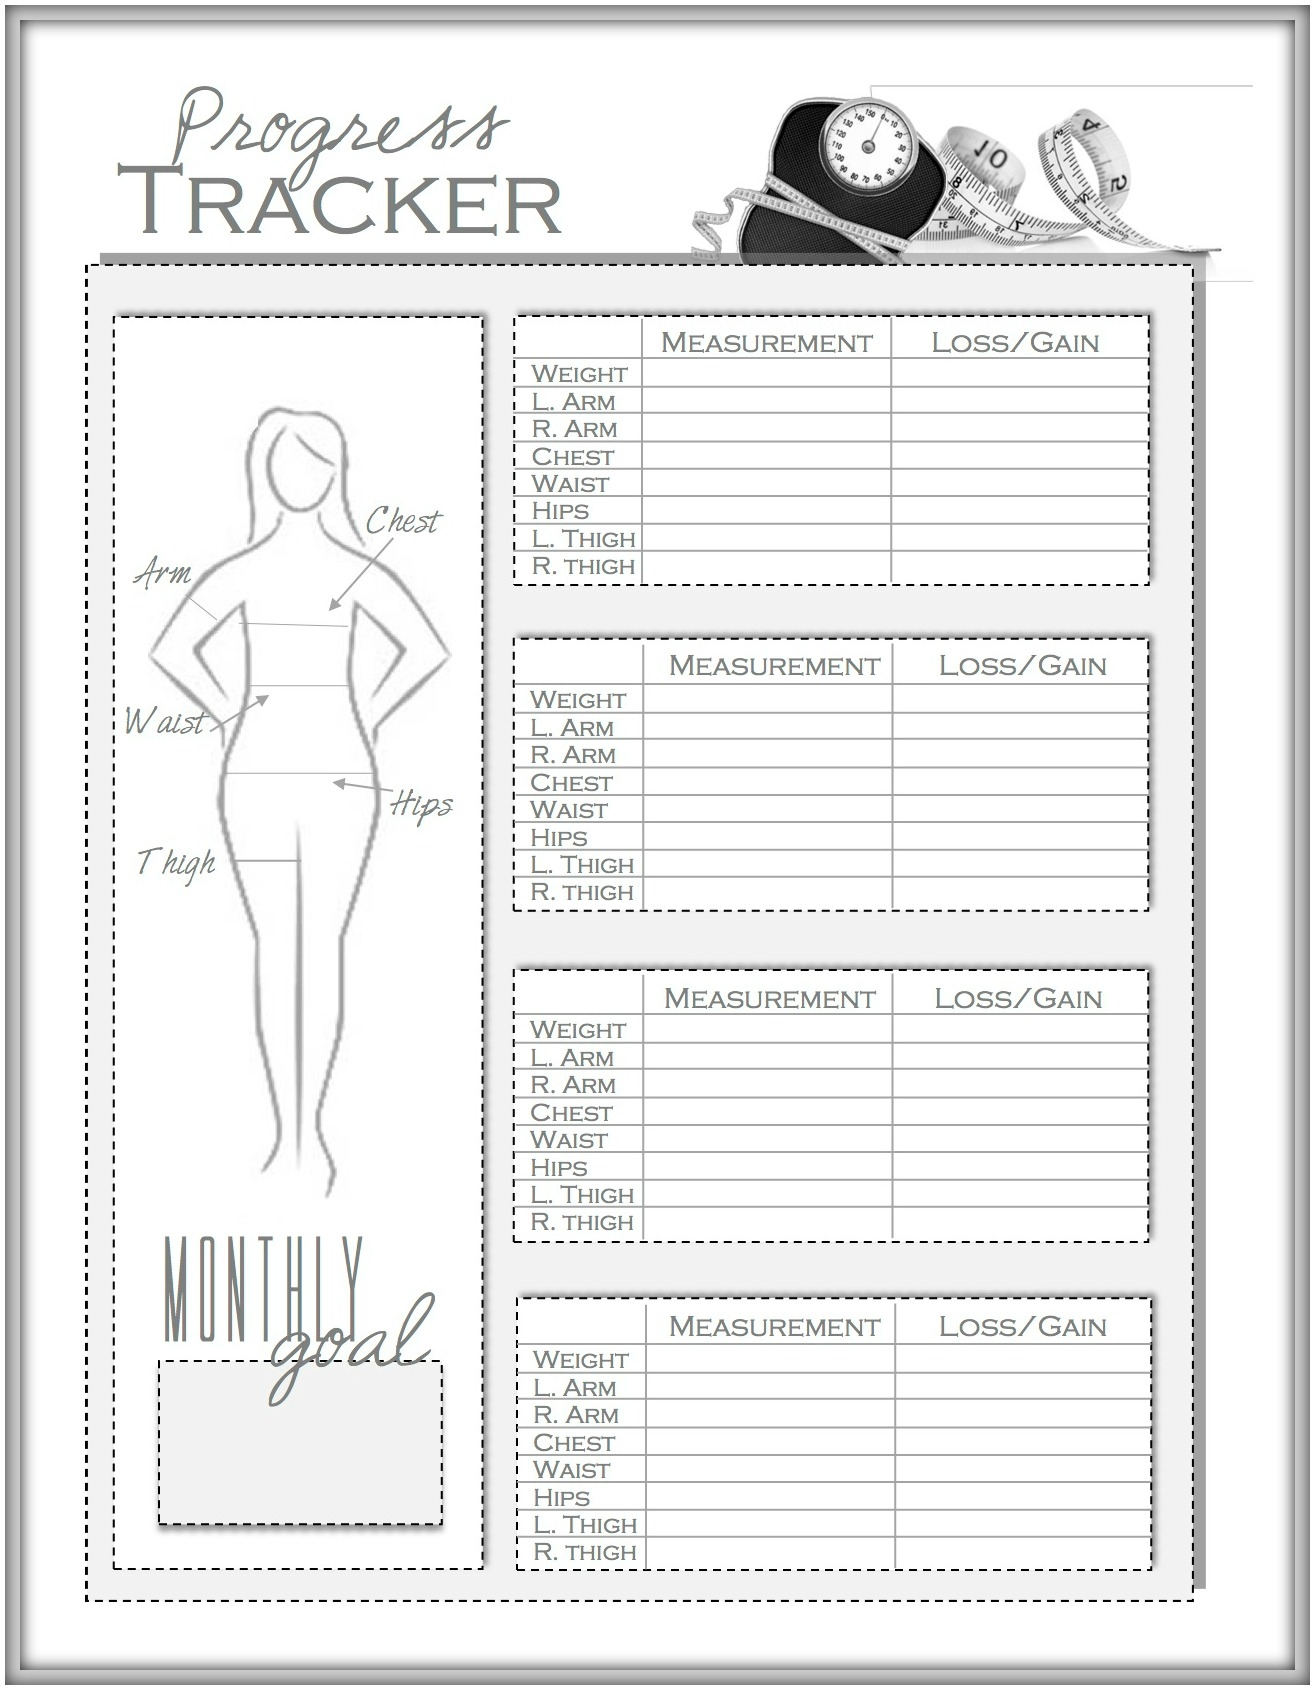 weight loss and measurement progress tracker weightlosstips